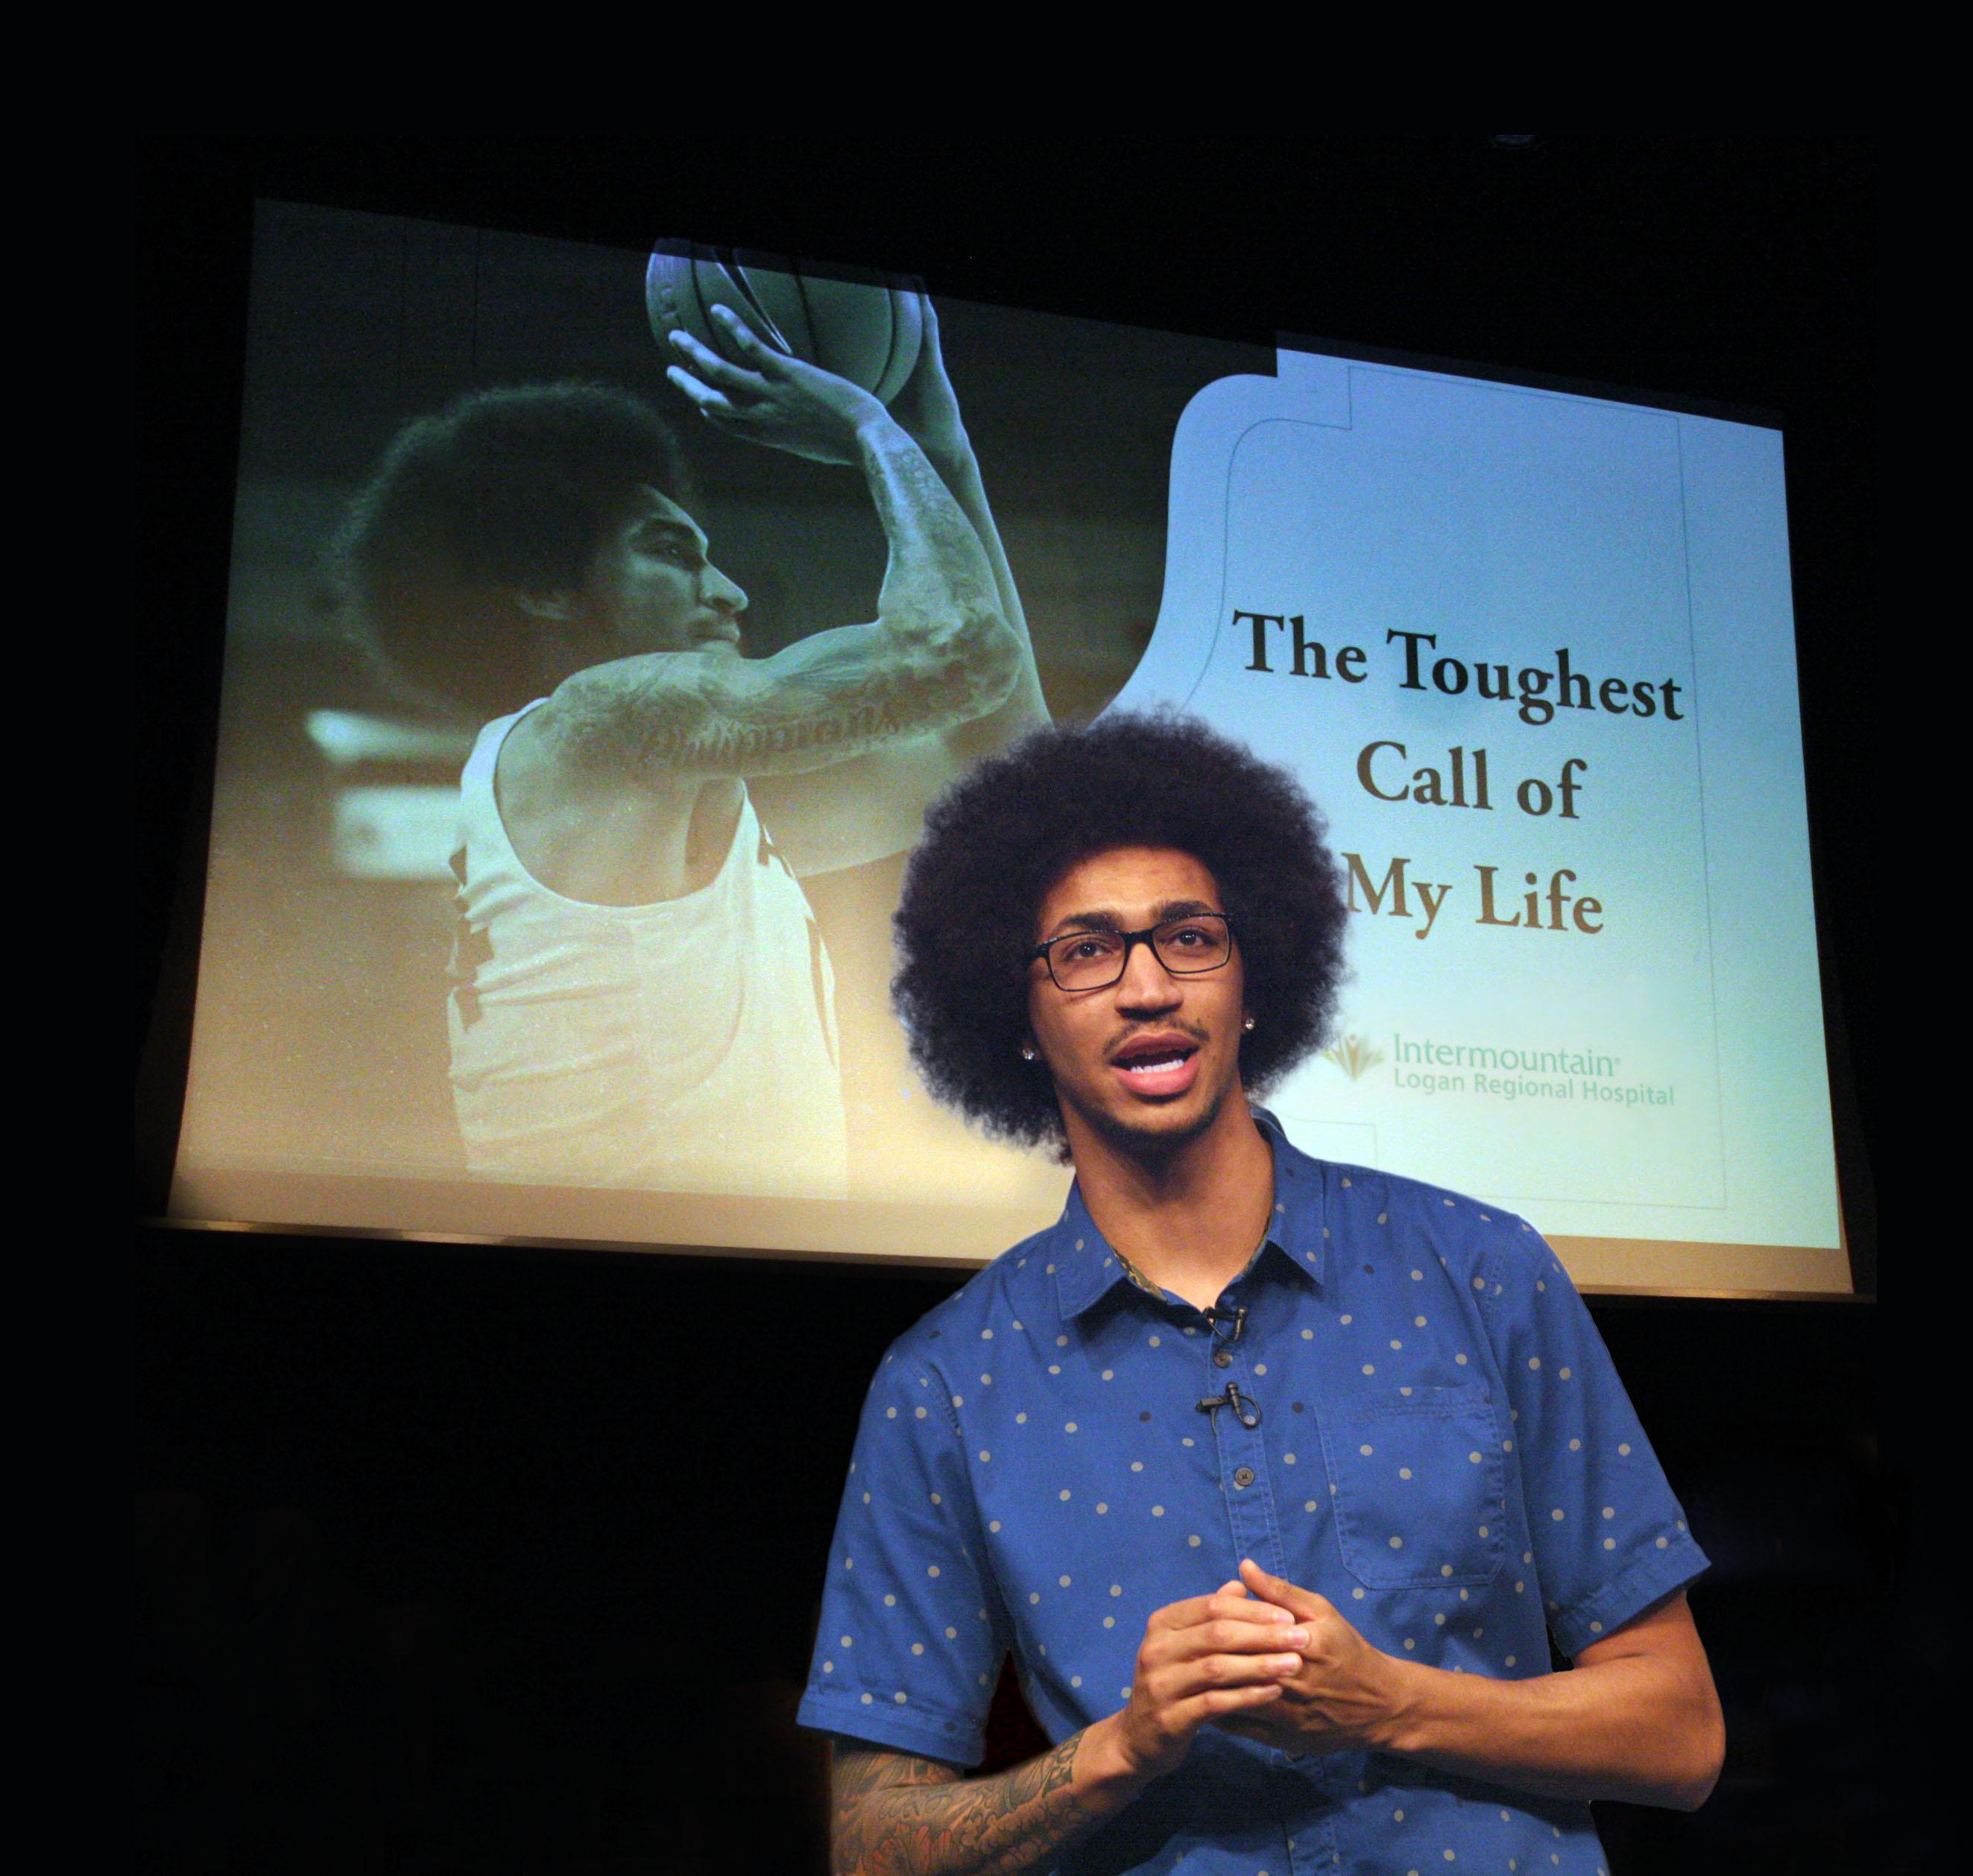 Jalen Moore speaking at Intermountain event